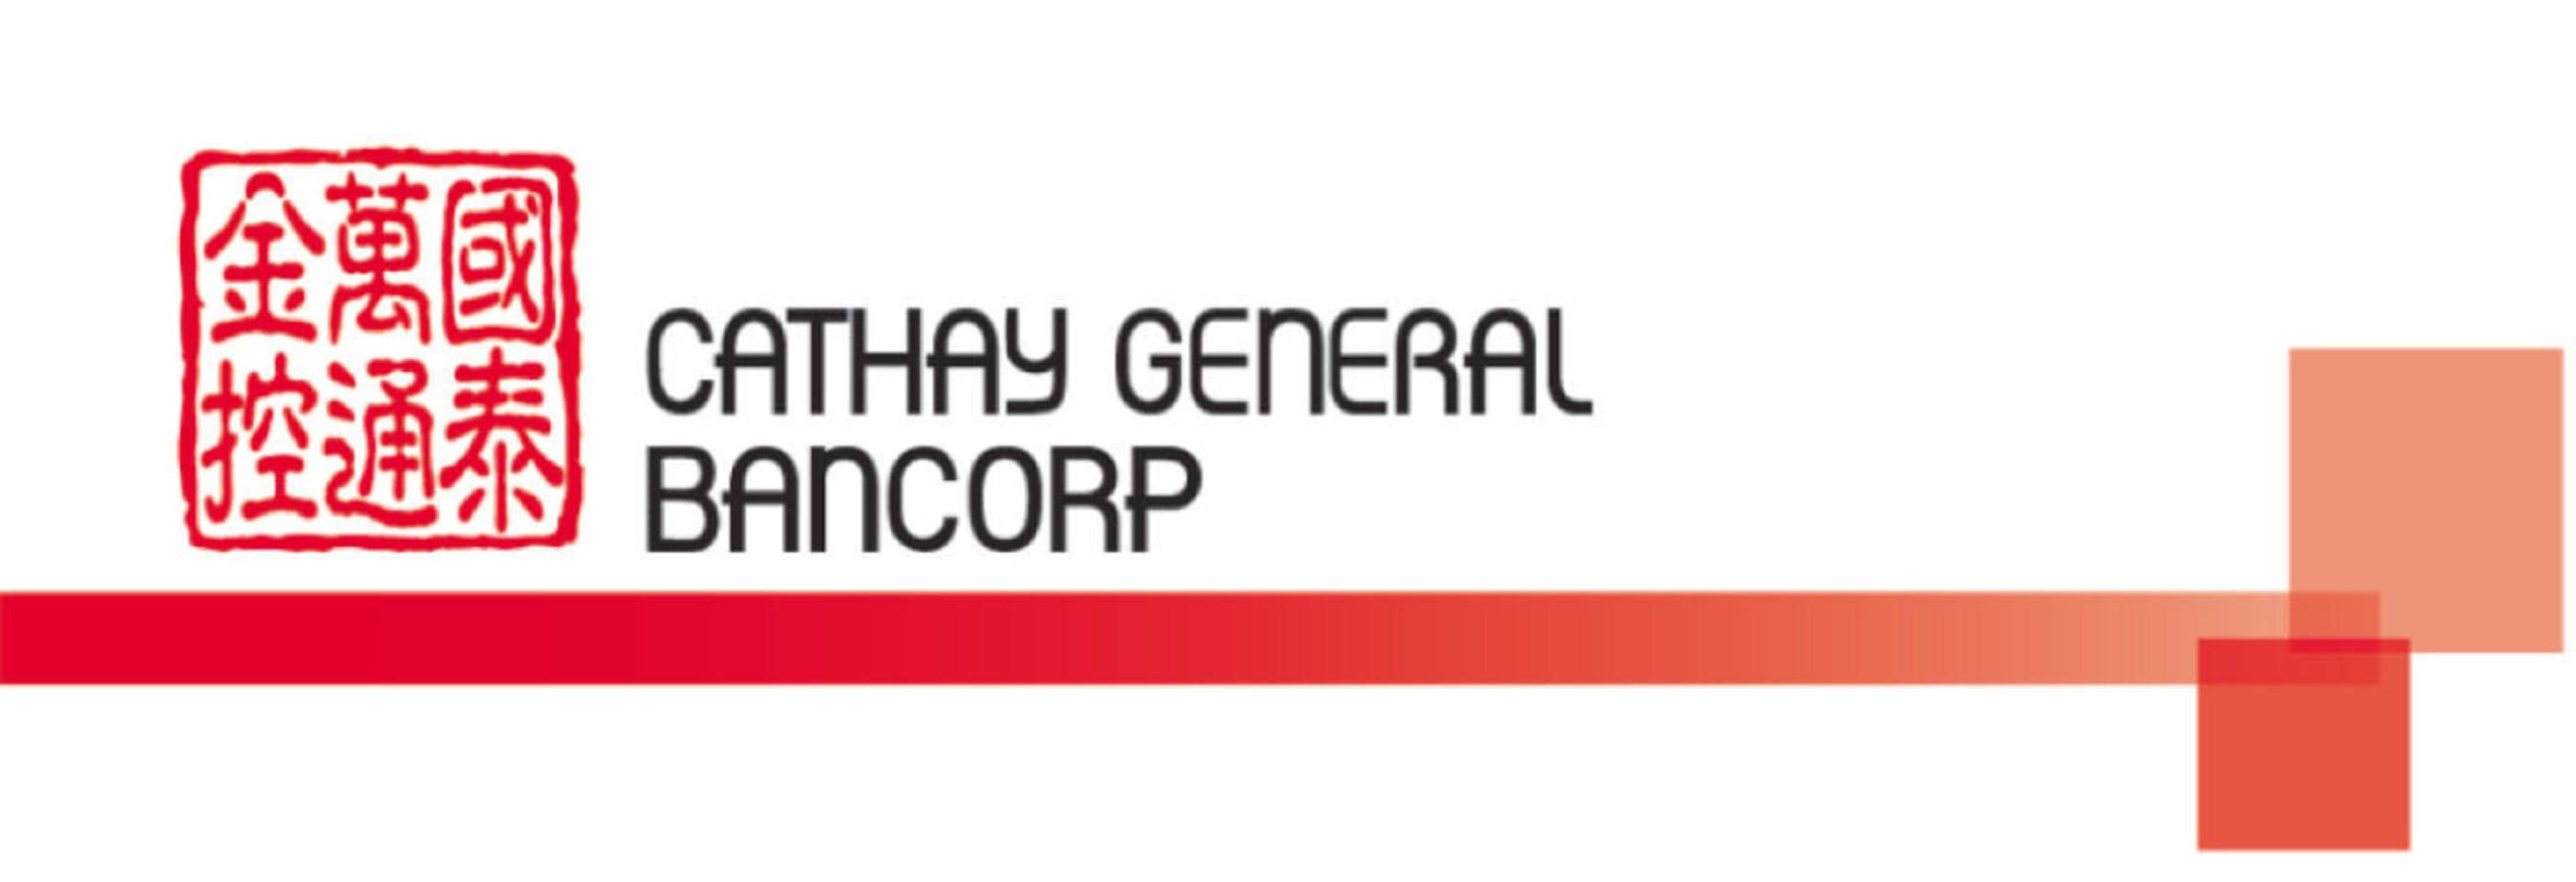 Cathay General Bancorp